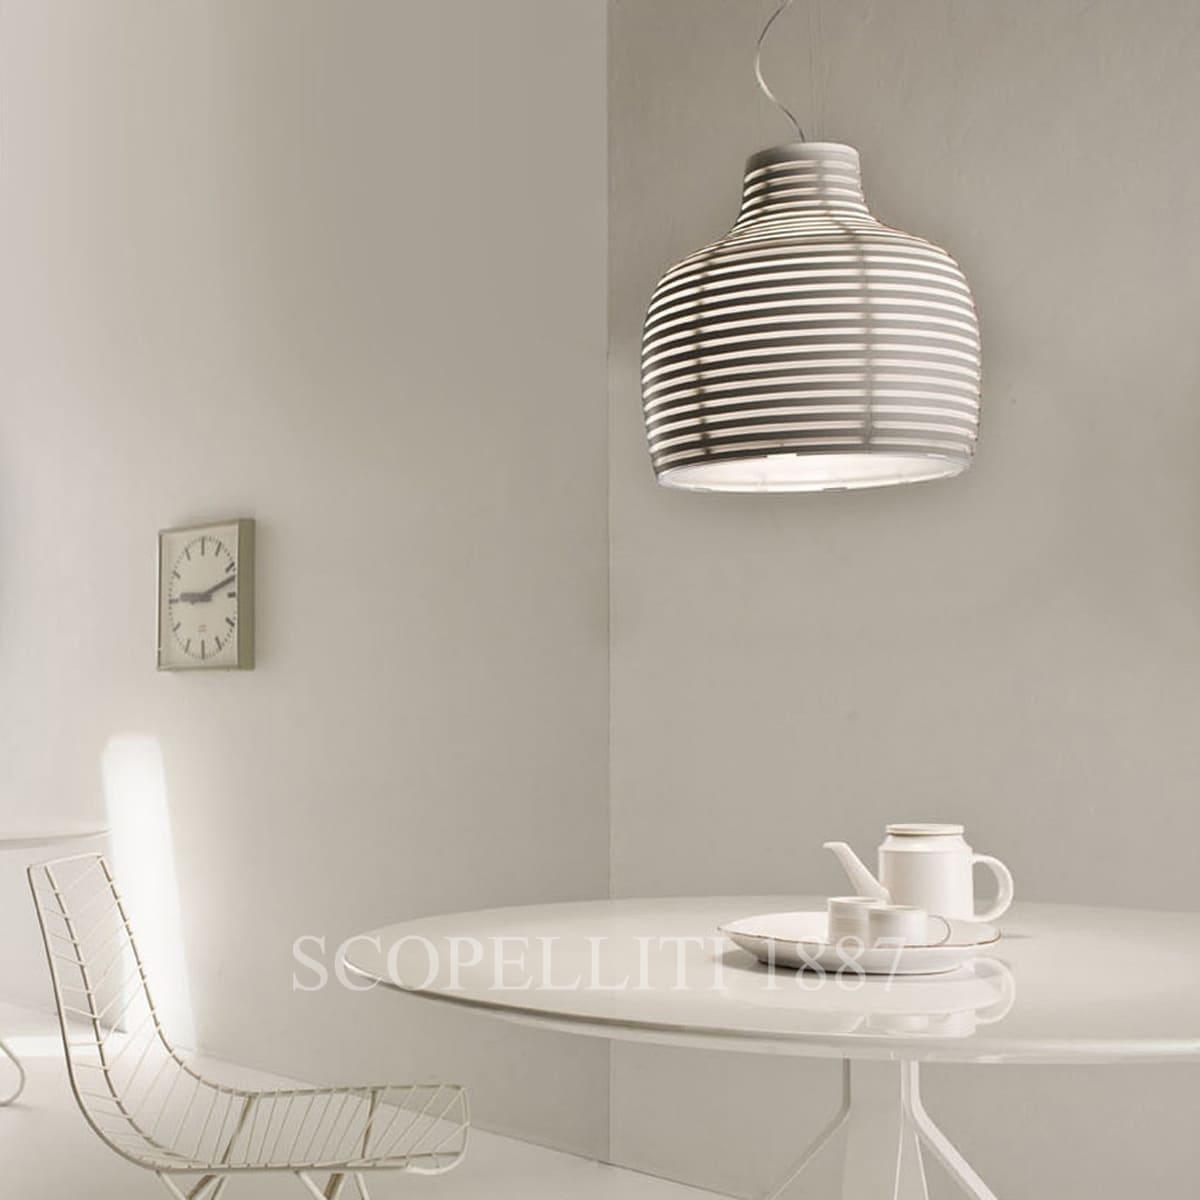 foscarini italian lighting designer suspension lamp behive two